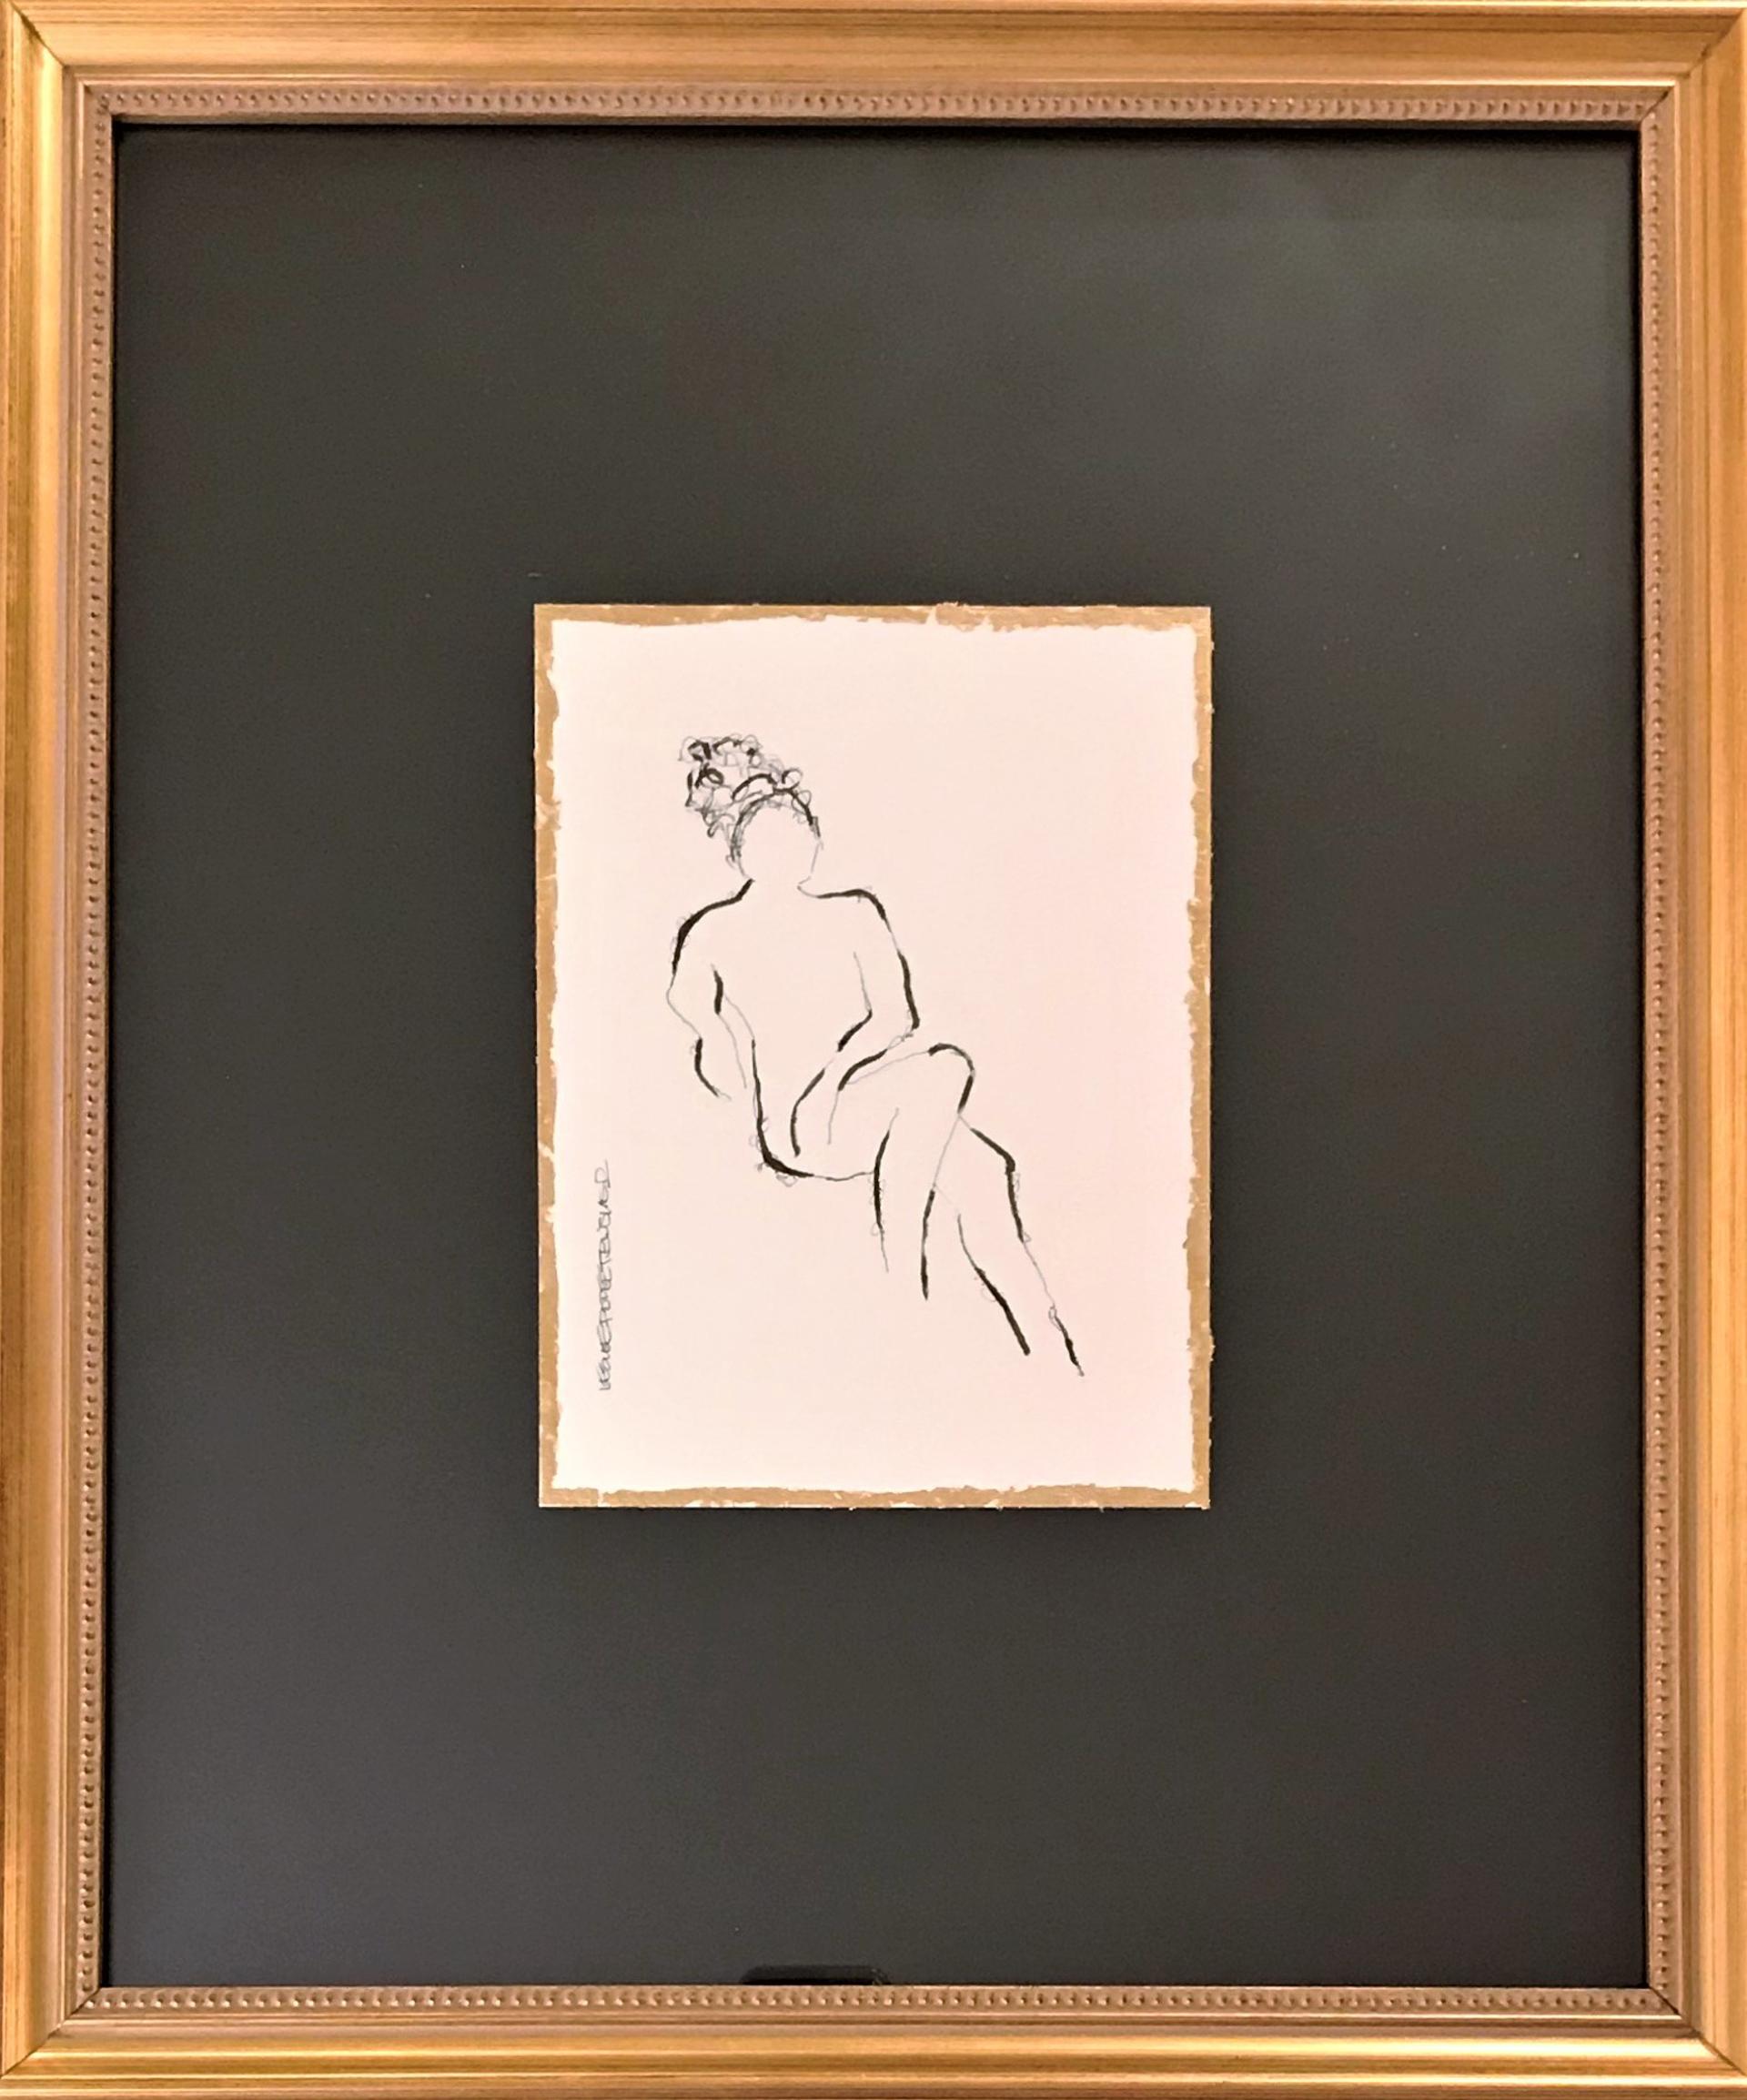 Figure No. 152 by Leslie Poteet Busker